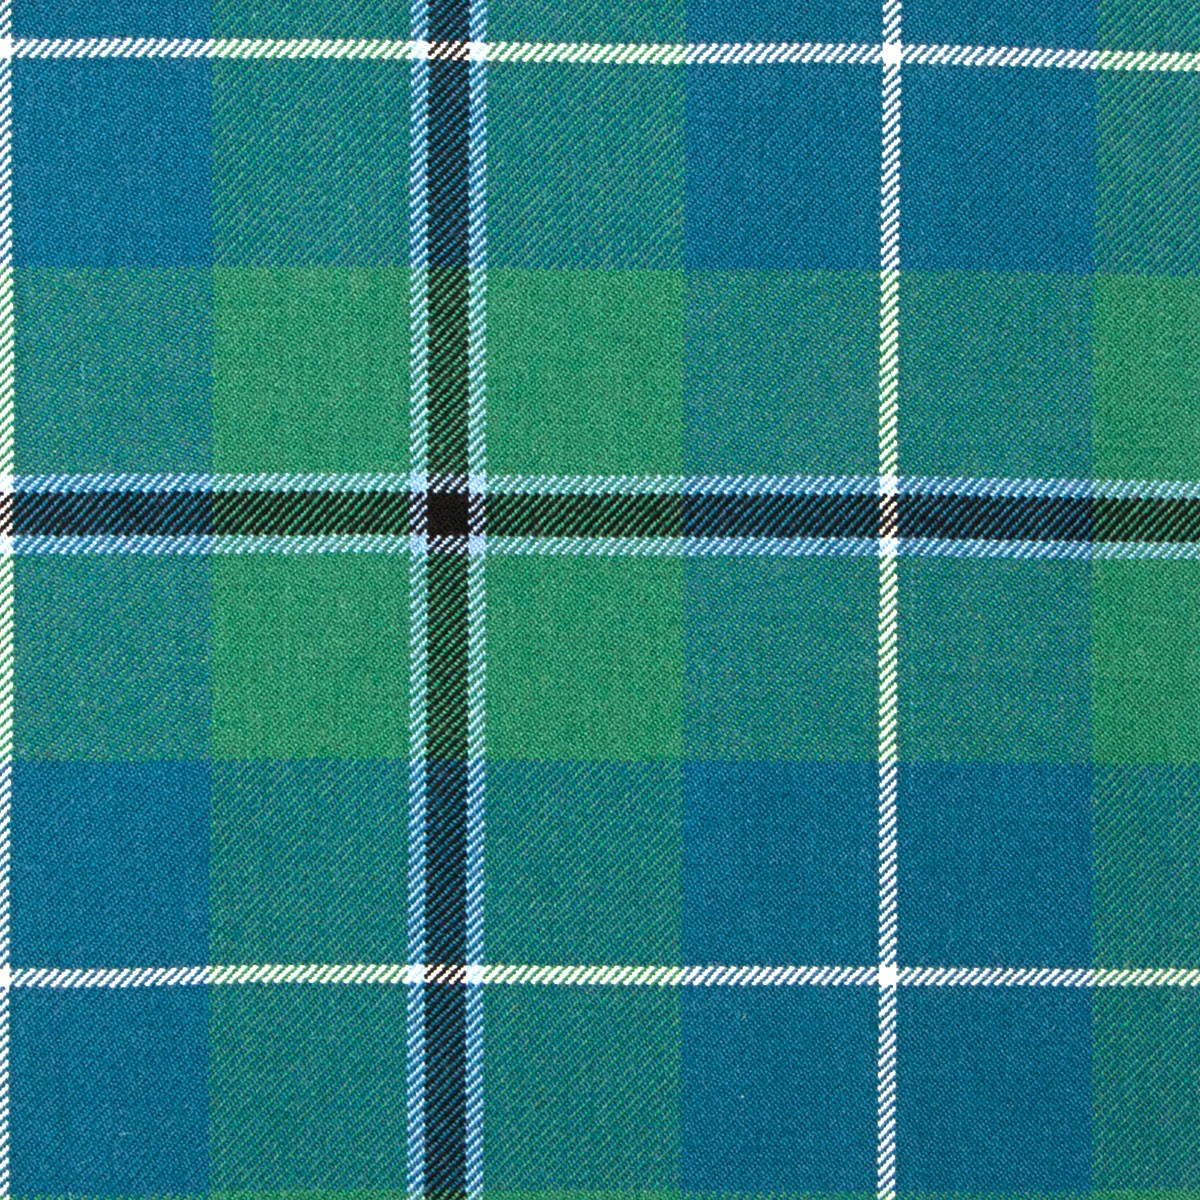 Douglas Ancient Modern Tartan Fabric 16oz 100/% Pure Wool